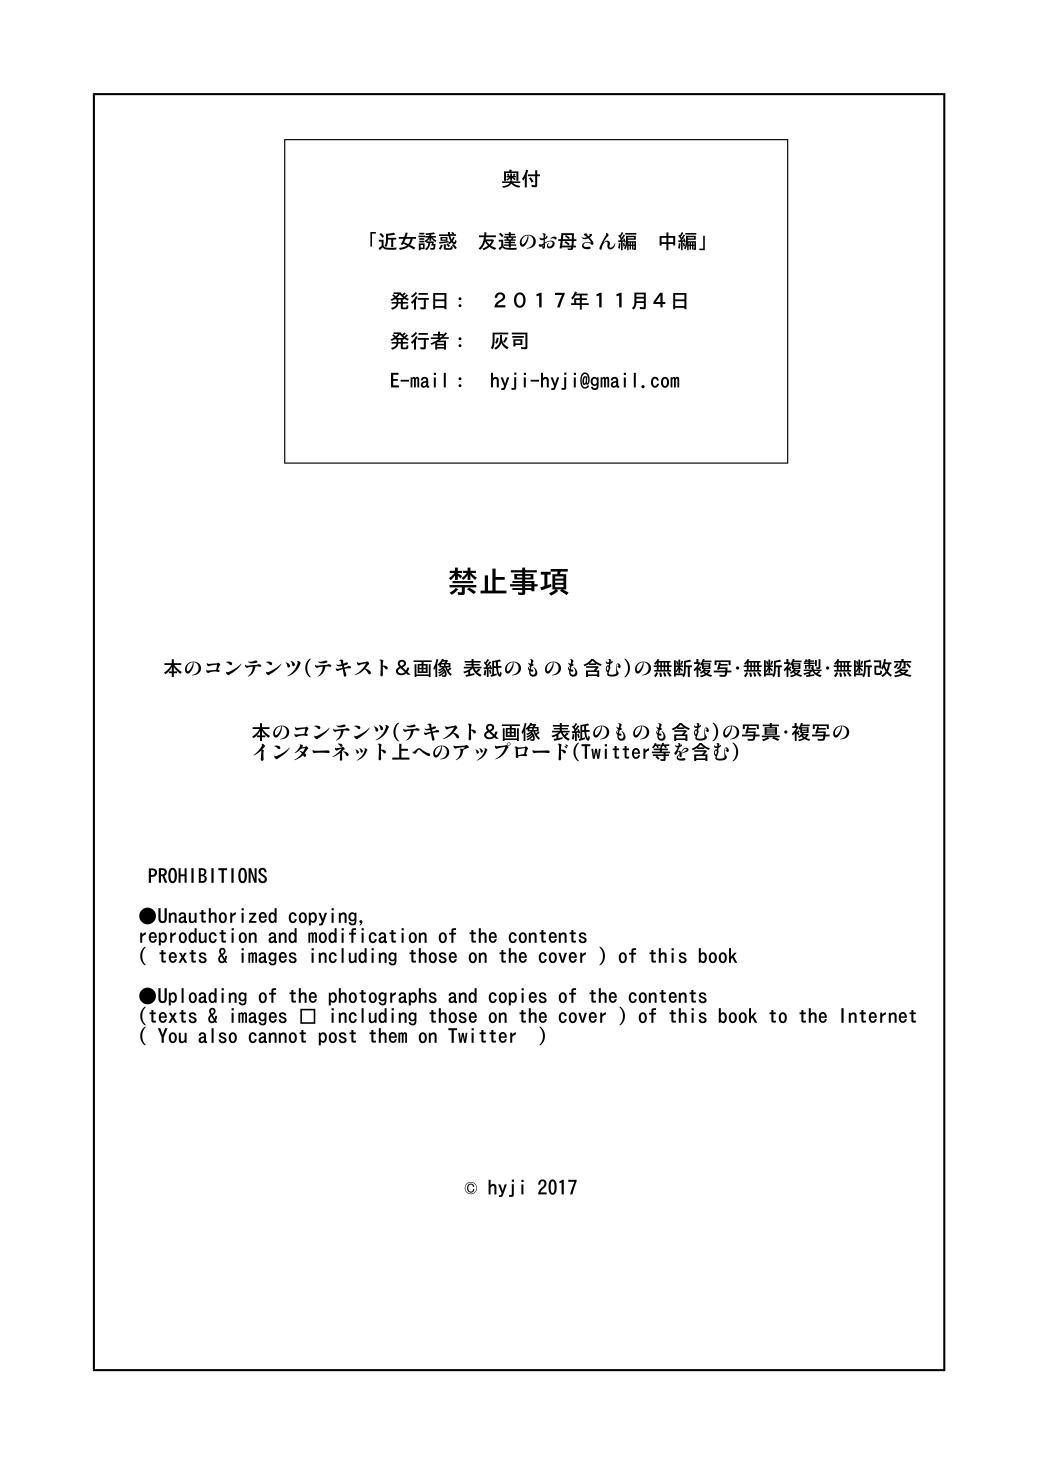 [Hyji] Kinjo Yuuwaku Daisandan -Tomodachi no Okaa-san Hen- Chuuhen | Seducing the Neighborhood Lady - Friend's Mother Middle part [English] [Amoskandy] 68